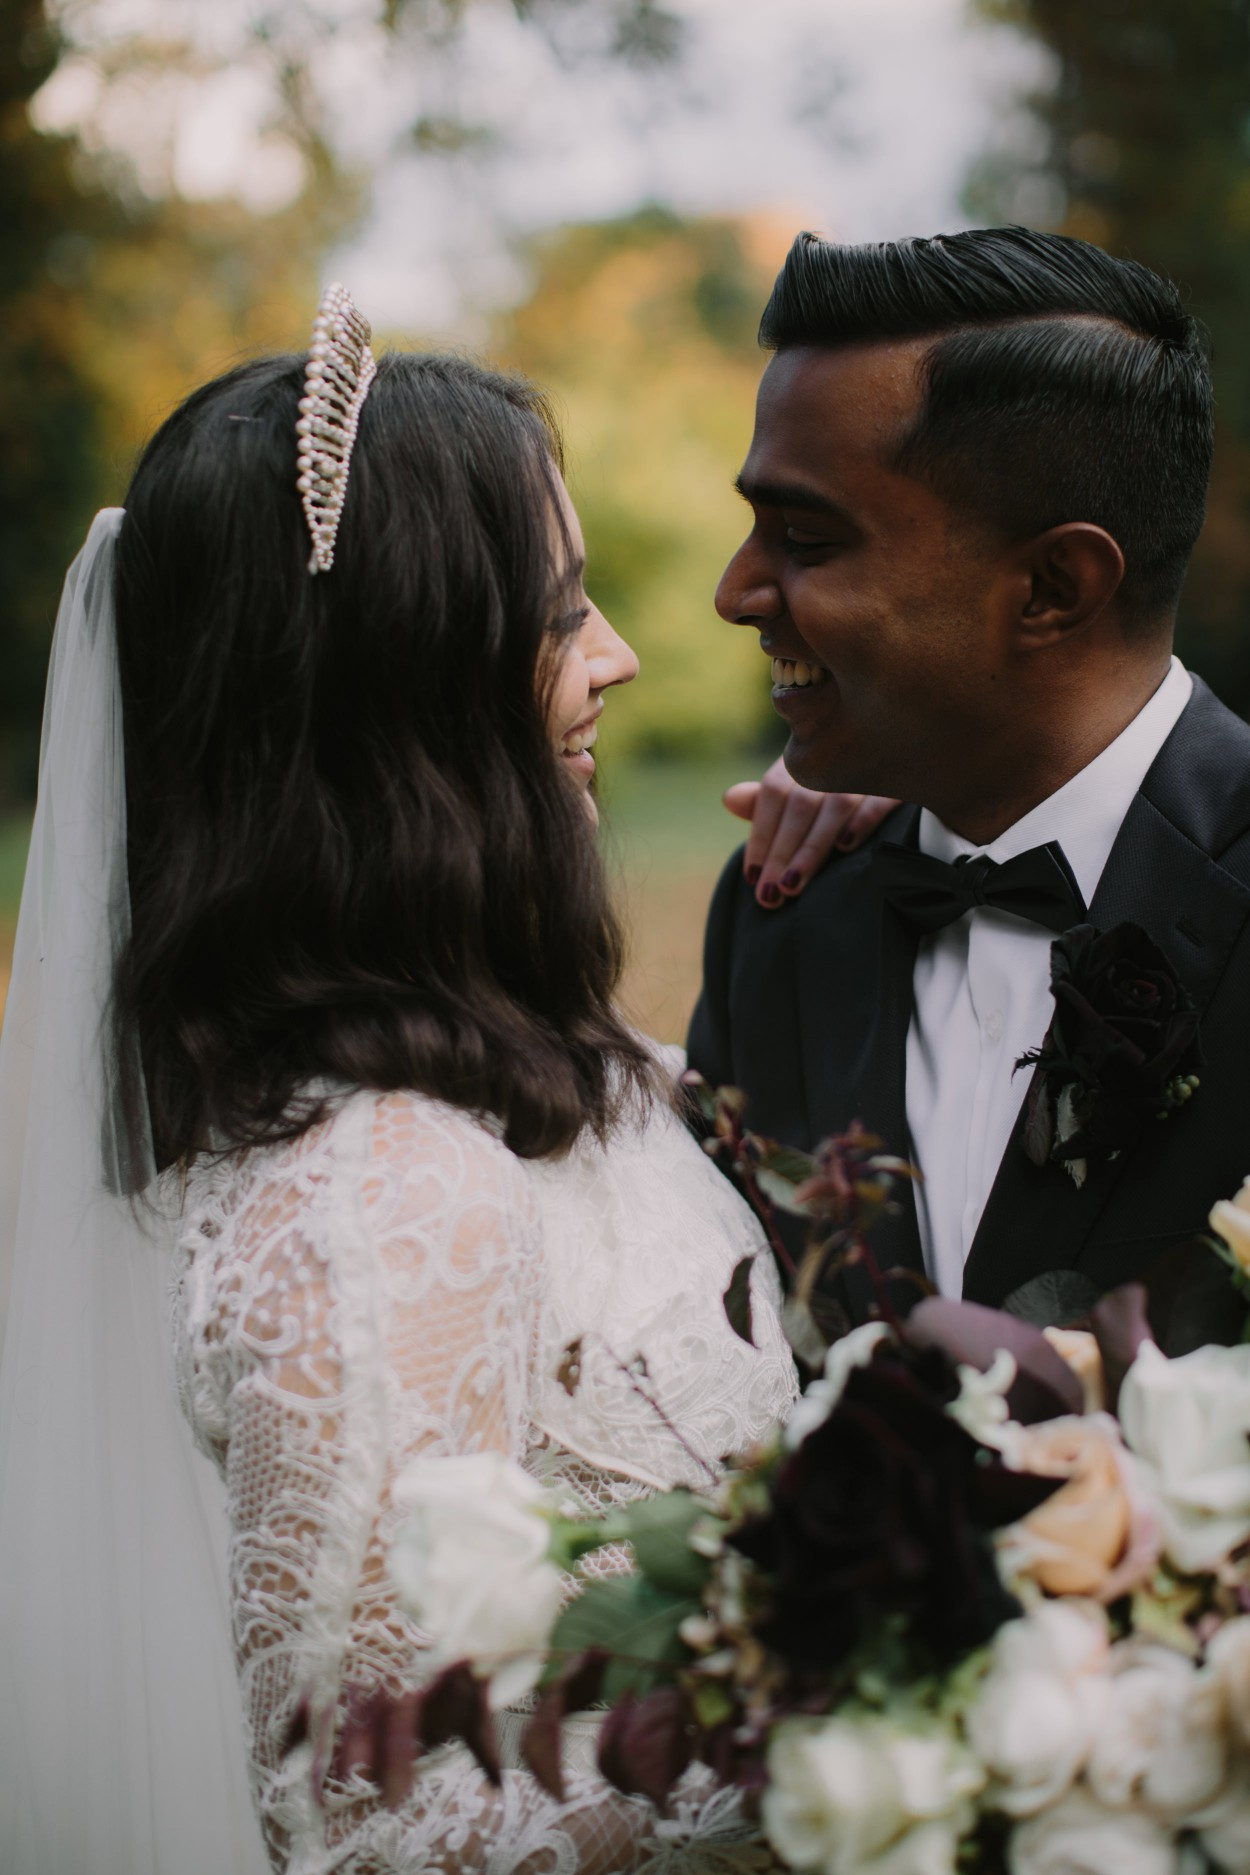 I-Got-You-Babe-Weddings-The-071George-Ballroom-St-Kilda-Wedding-Amy-Abhi.jpg